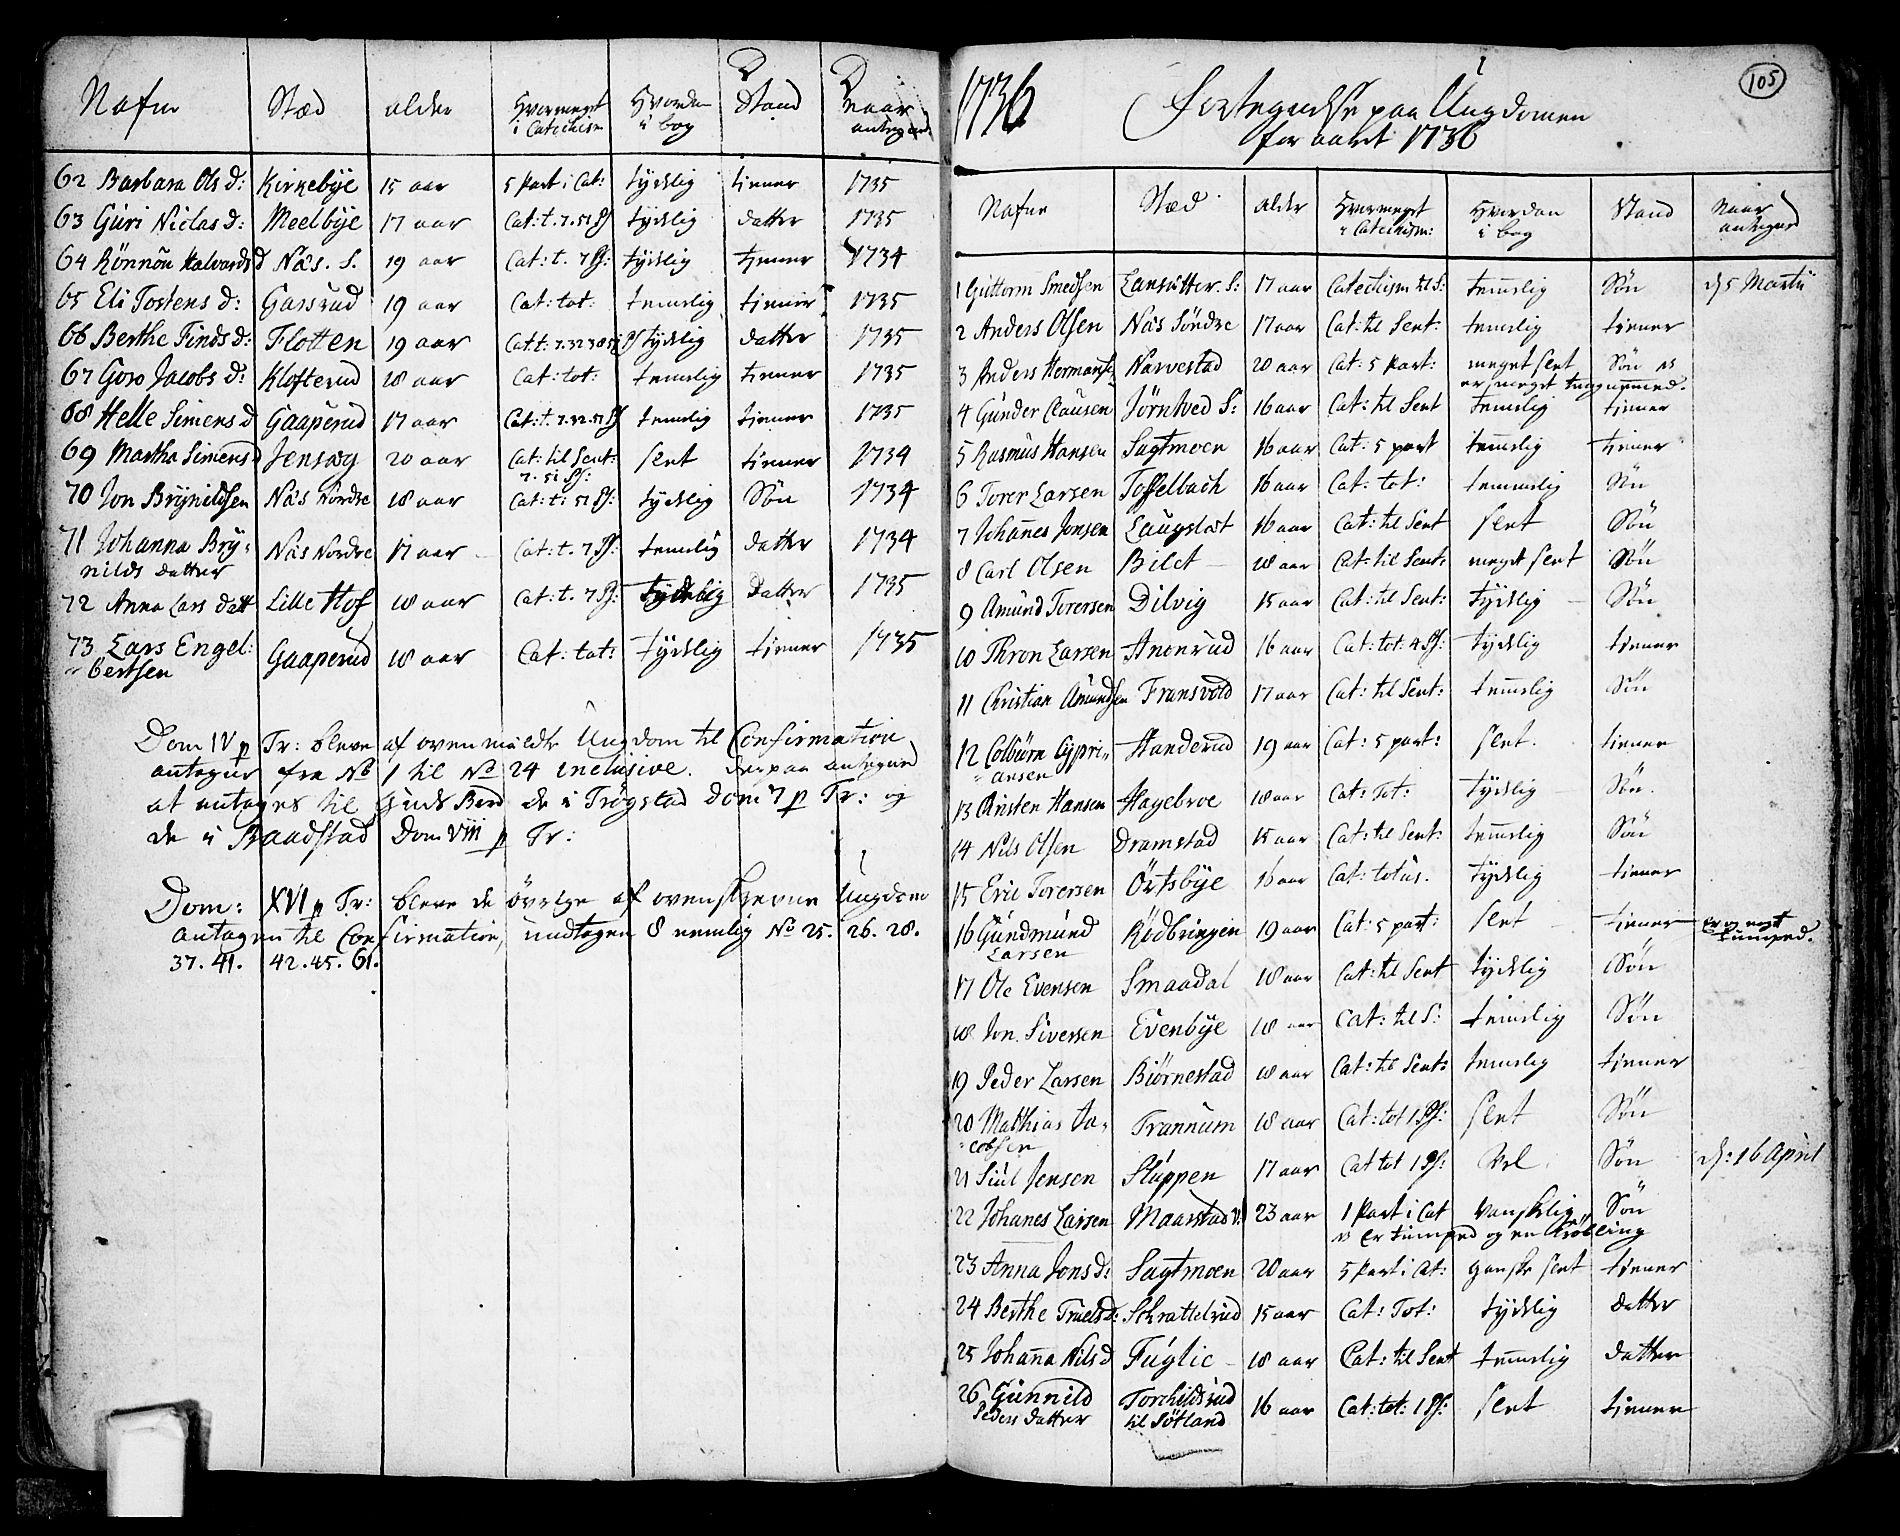 SAO, Trøgstad prestekontor Kirkebøker, F/Fa/L0003: Ministerialbok nr. I 3, 1721-1749, s. 105